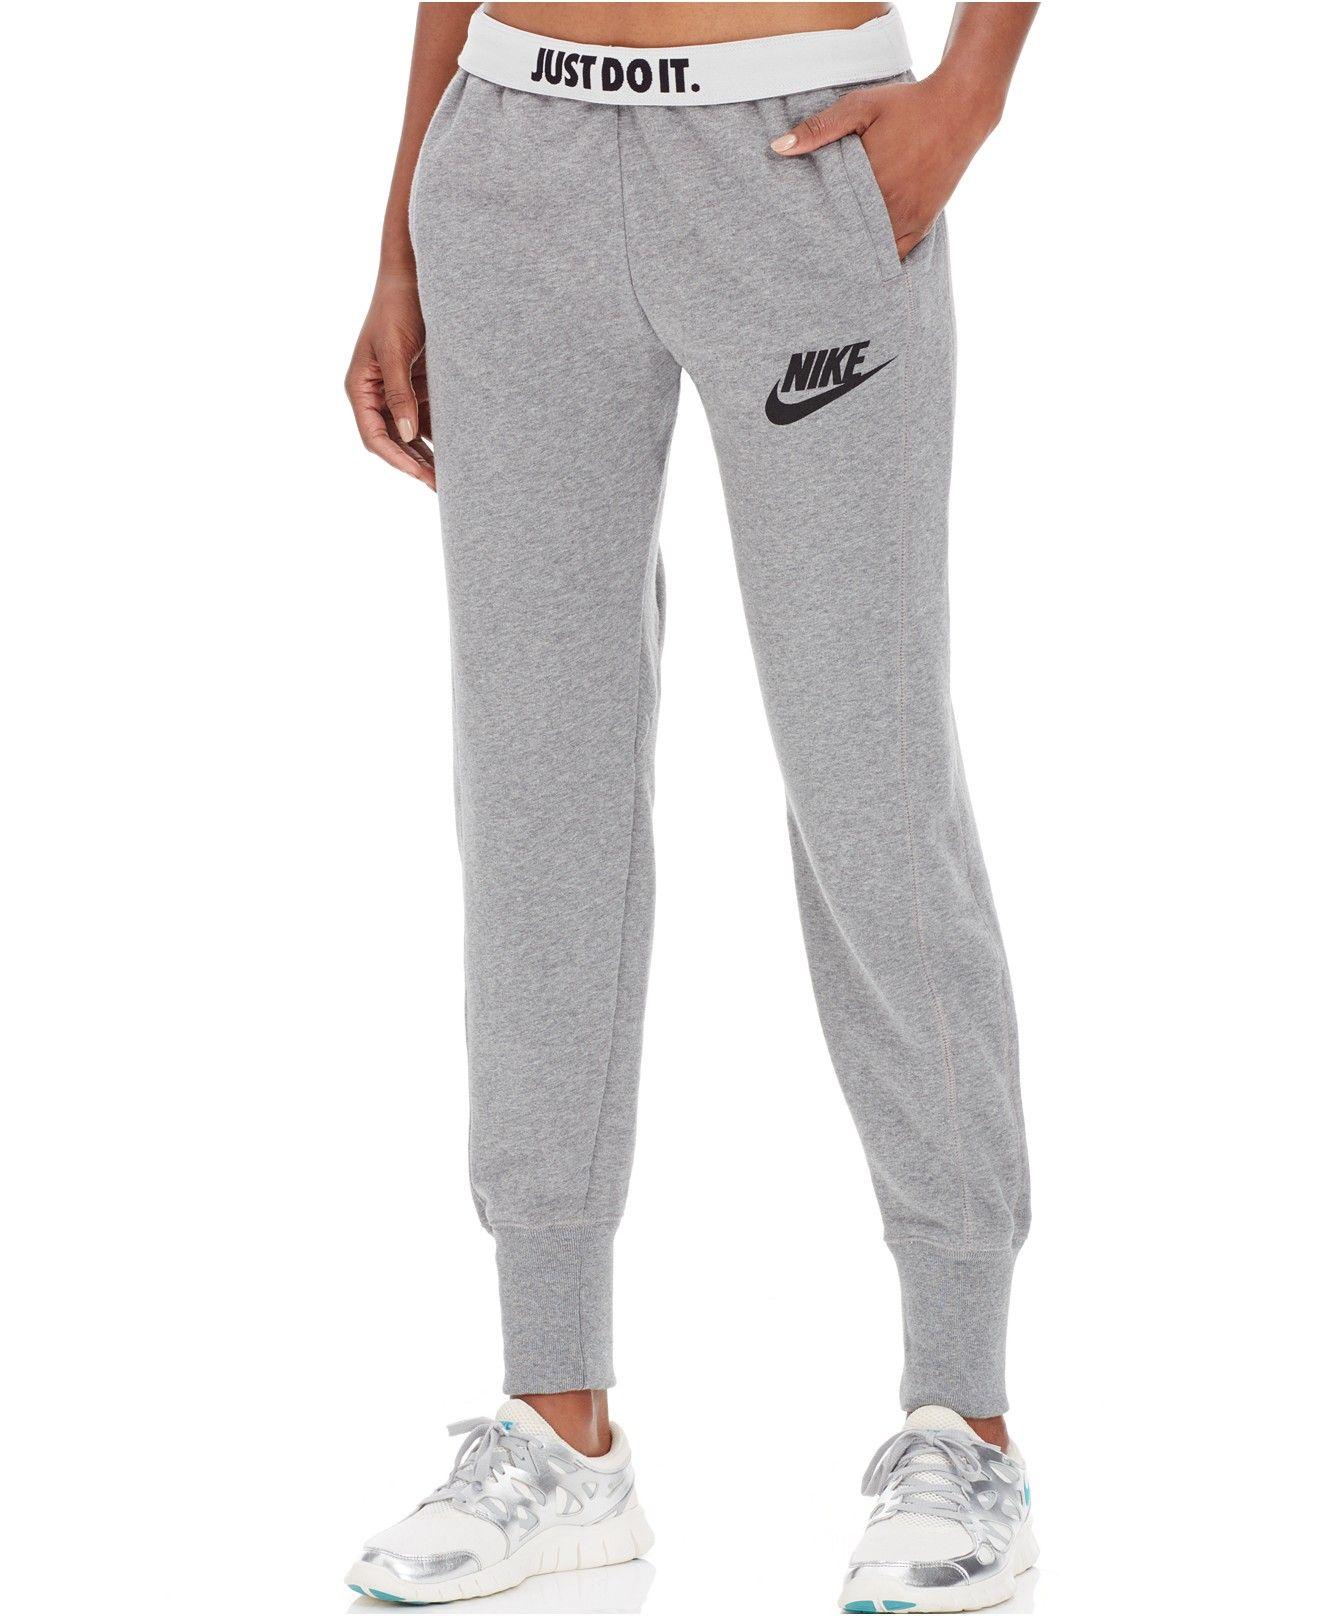 Nike Rally Jogger Pants Reviews Pants Leggings Women Macy S Nike Outfits Pants For Women Jogger Pants